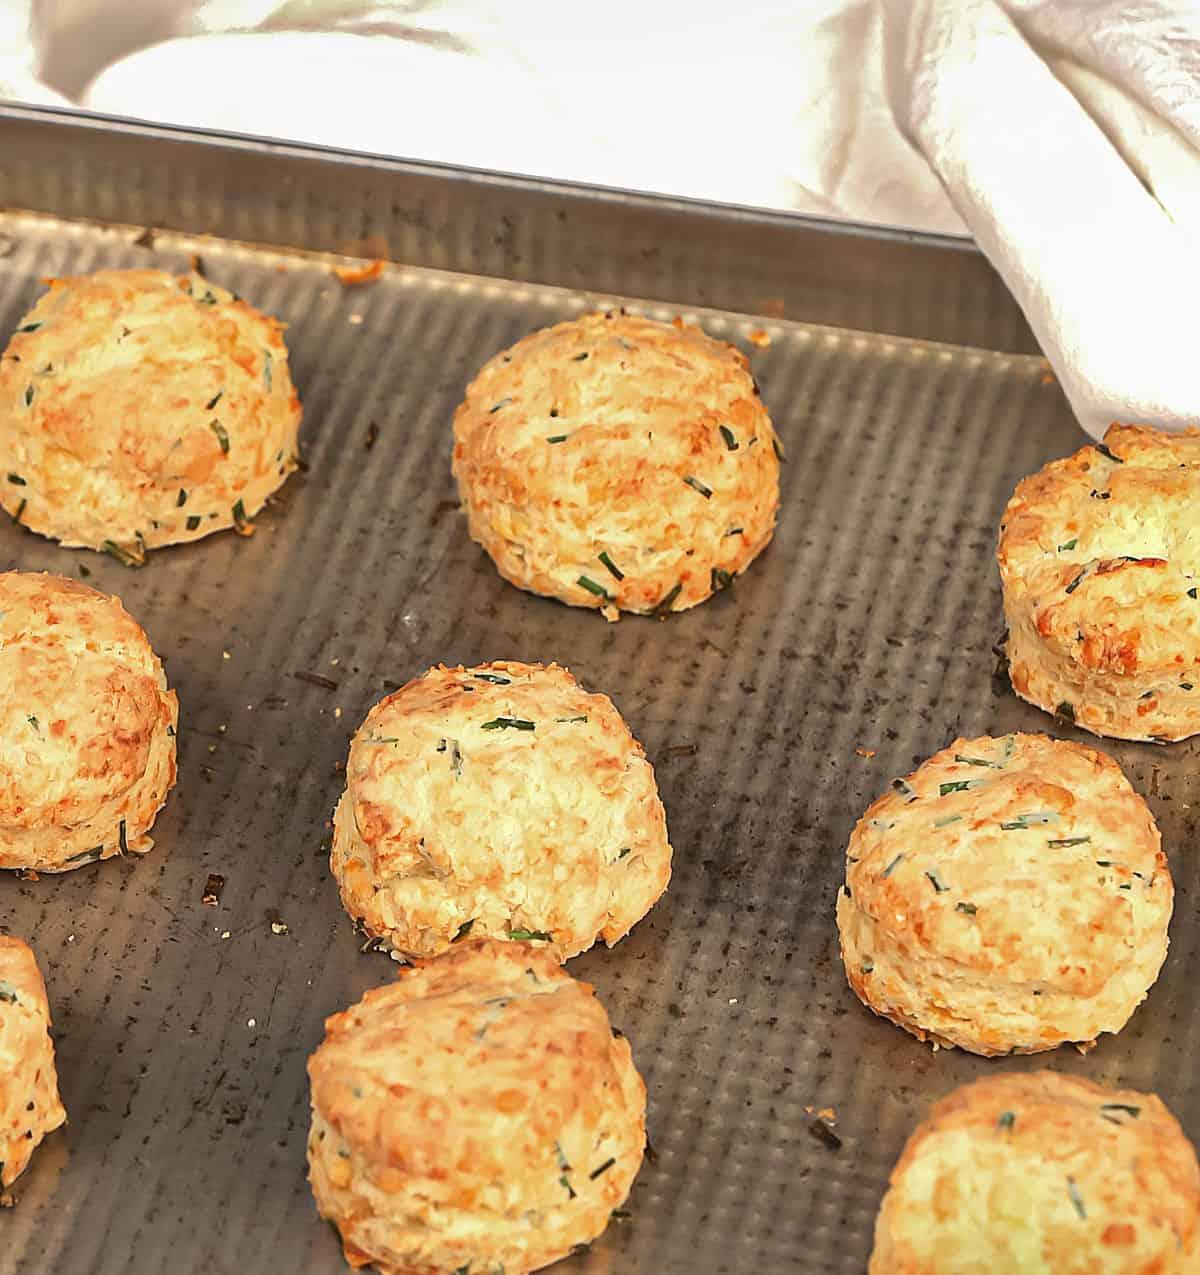 Baking sheet with baked golden scones